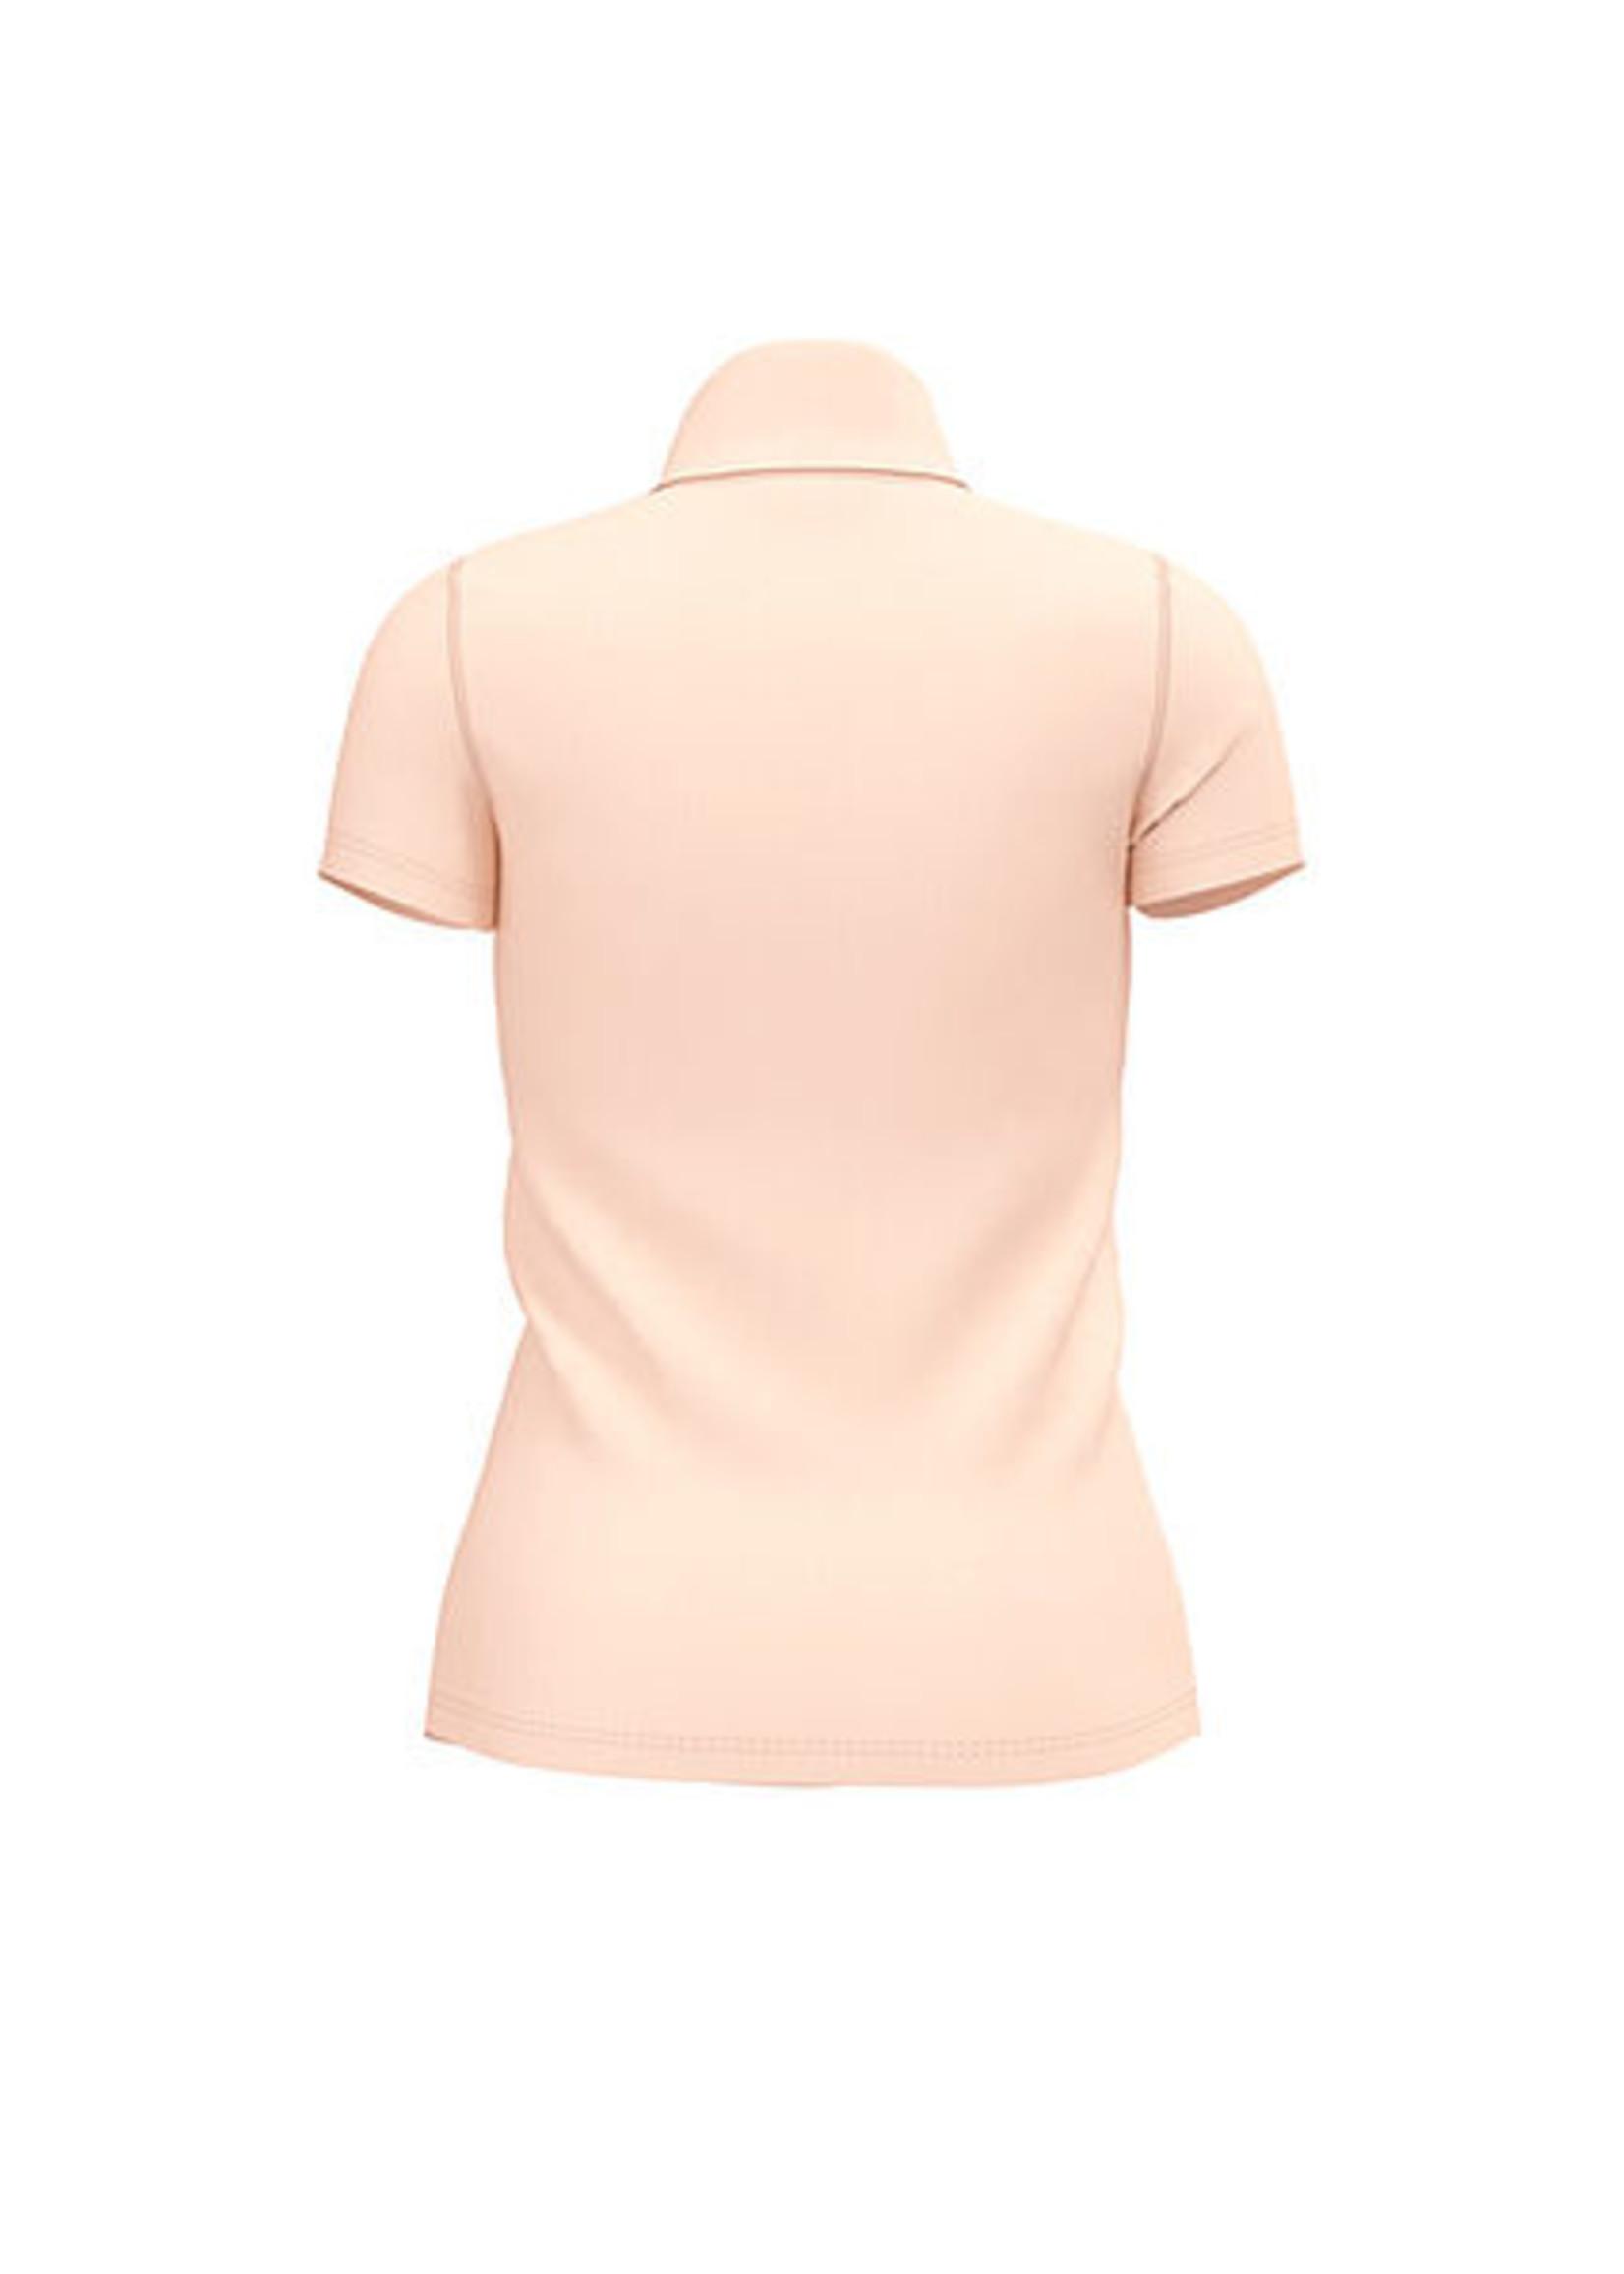 T-shirt RC 48.29 J14 panna cotta